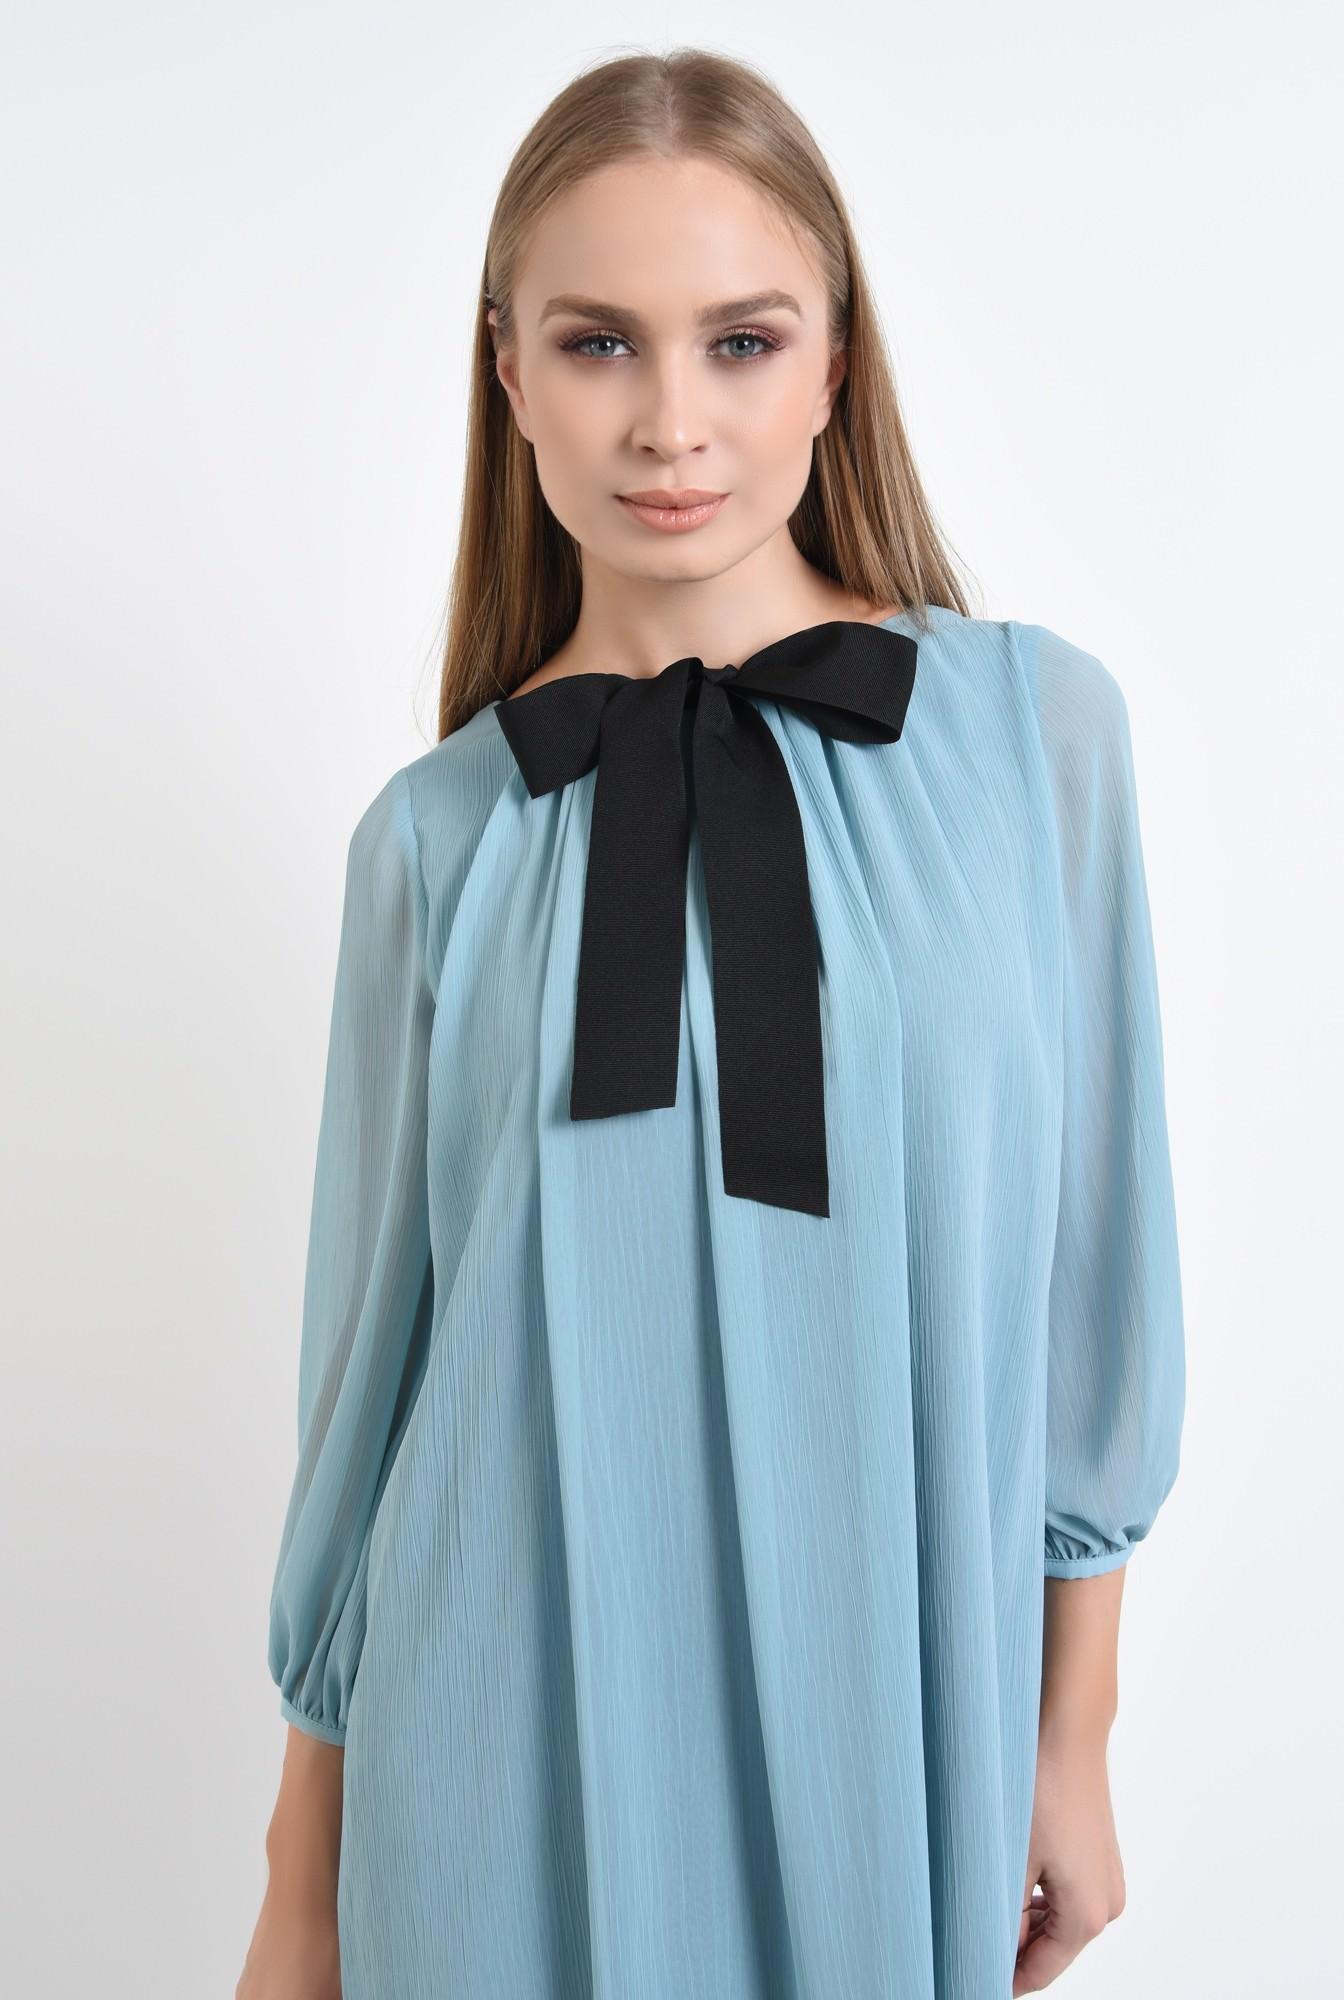 2 - rochie eleganta, bleu, rips, negru, contrast